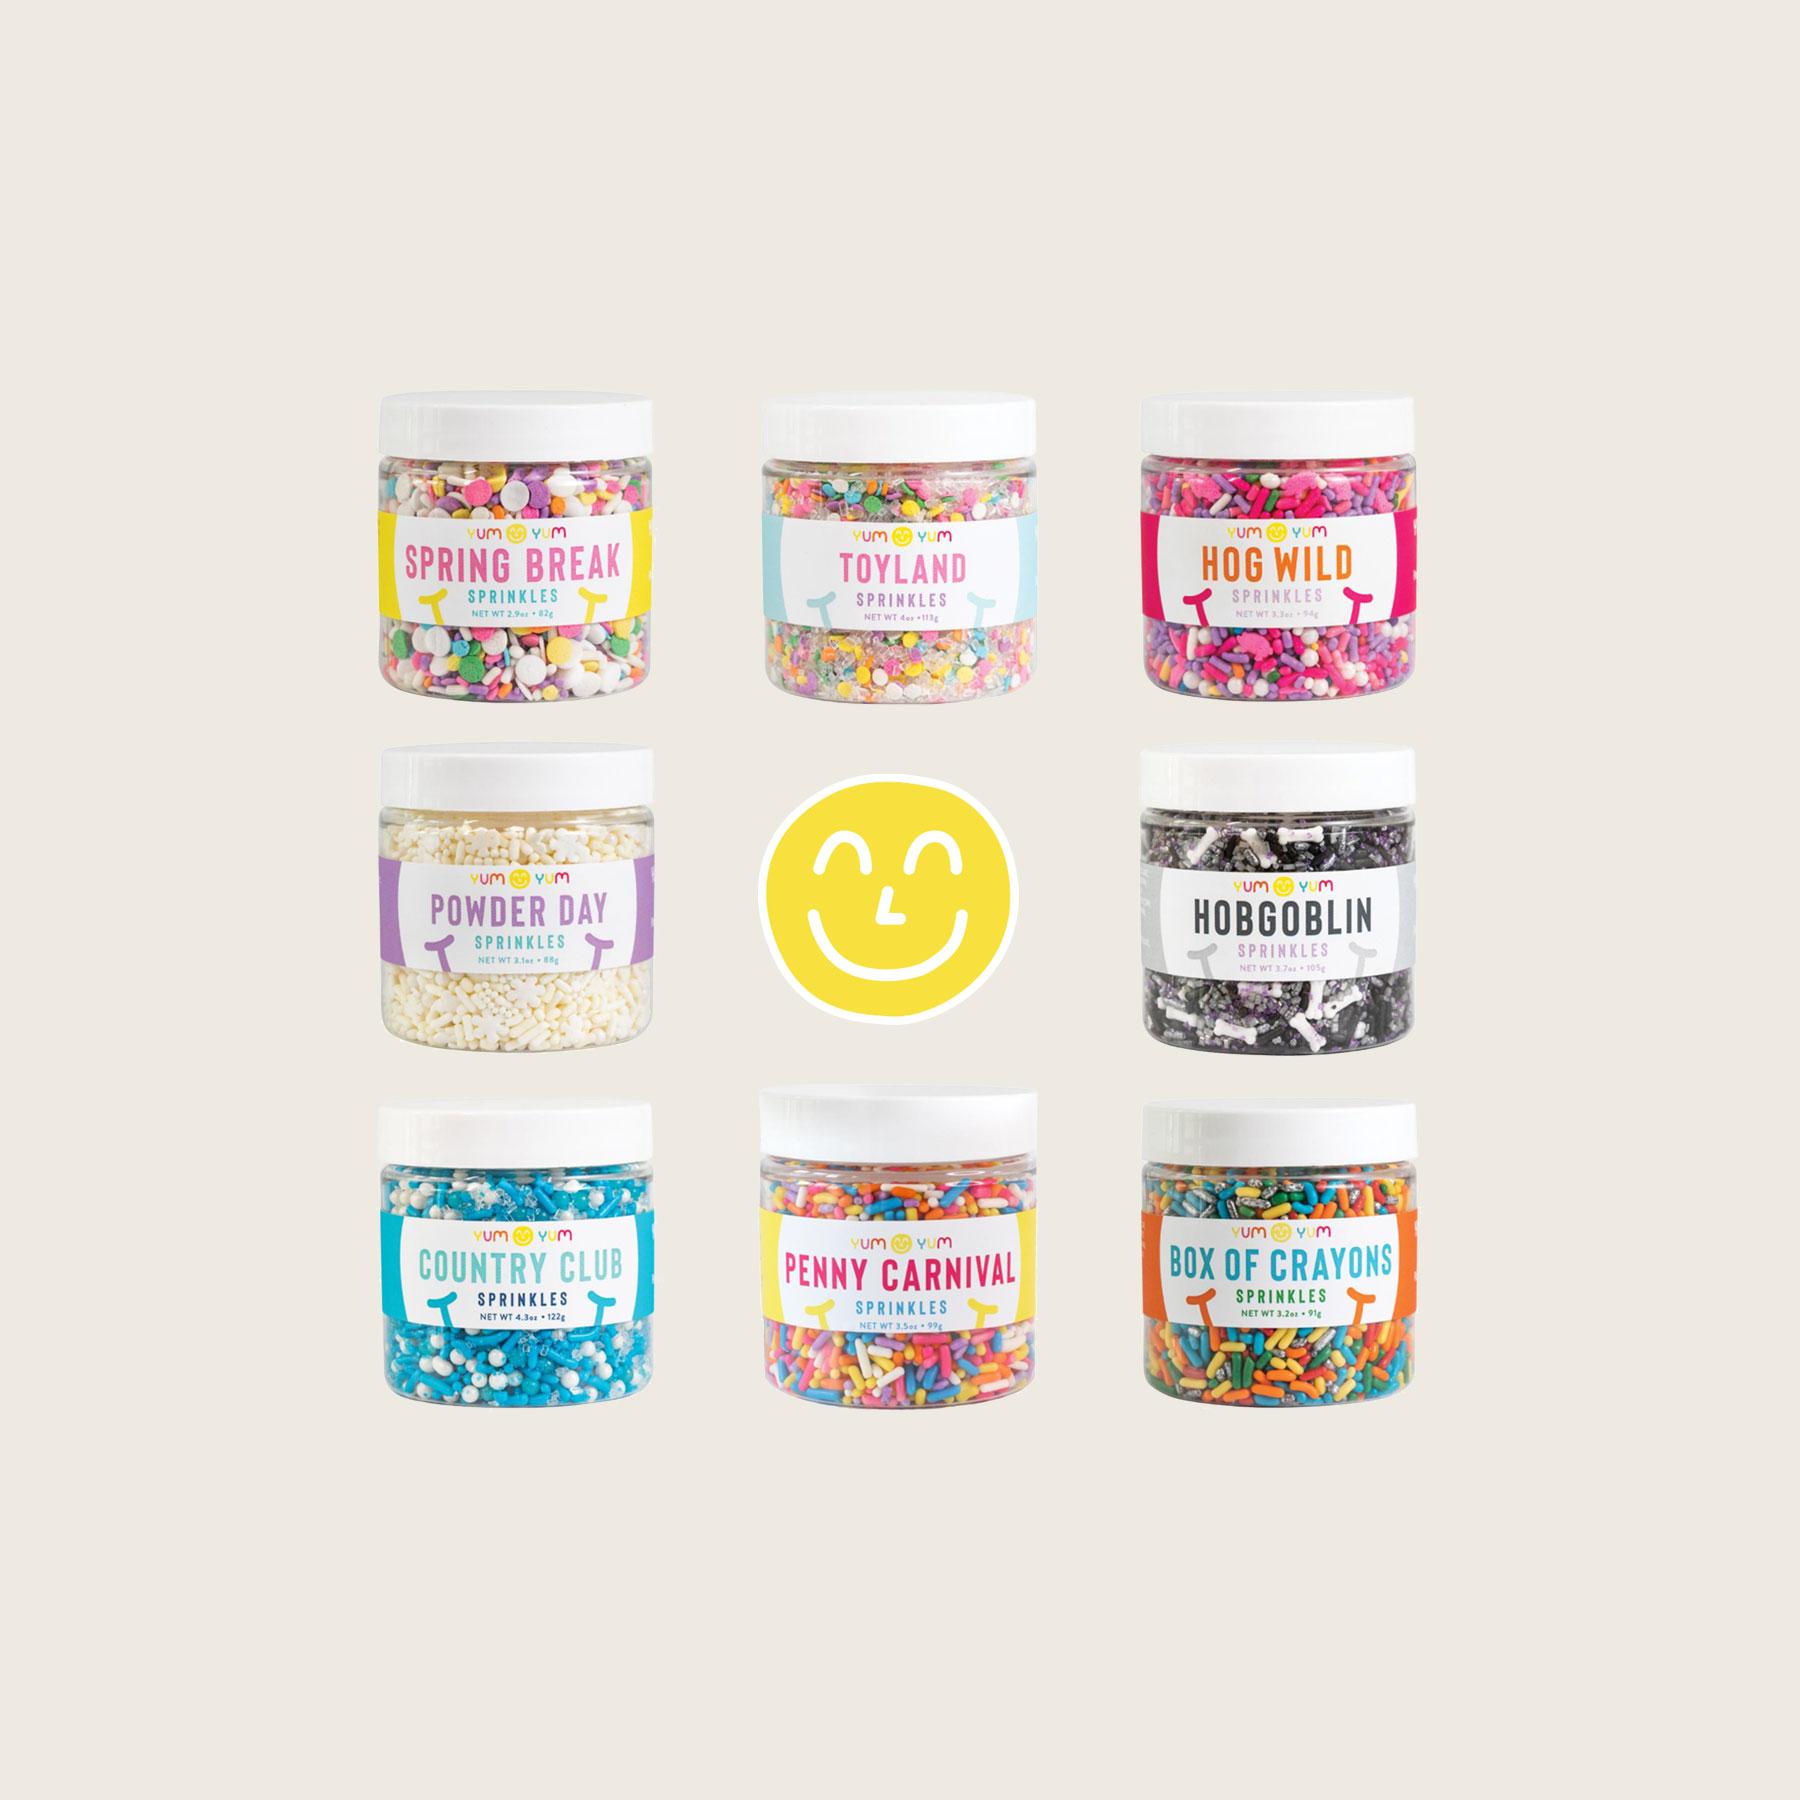 flourish-collaborative-libbie-summers-yum-yum-smile-shop-sprinkle-label-design.jpg